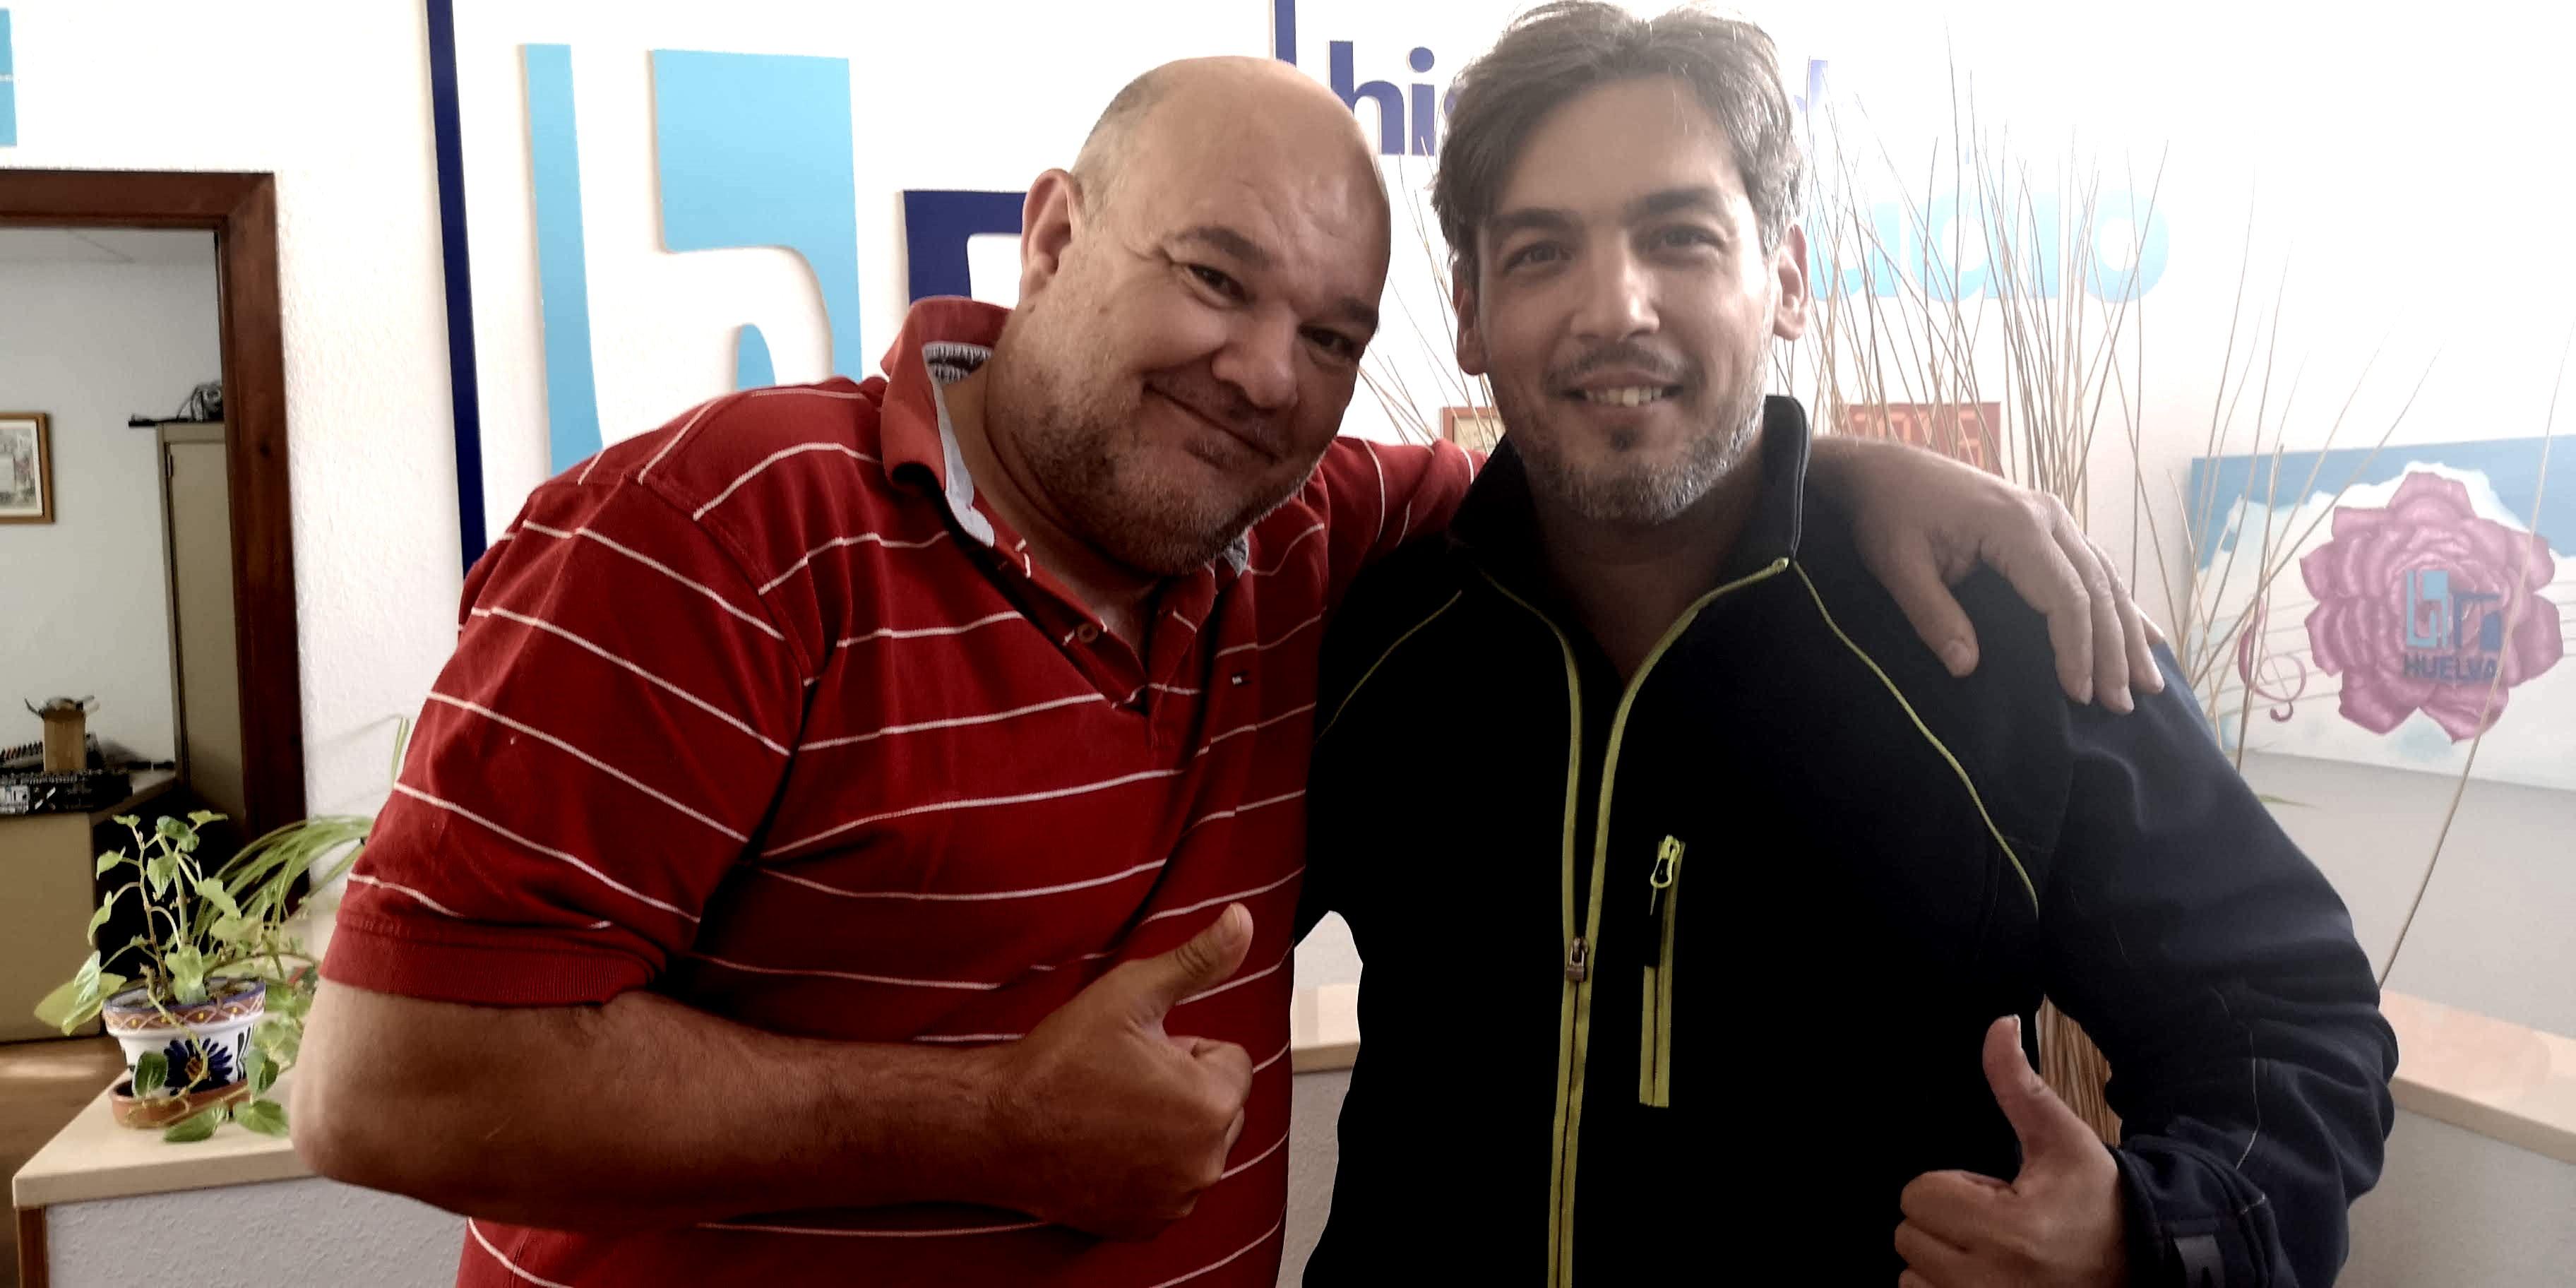 Anda que anda- 17-10-2019 Sergio Robles